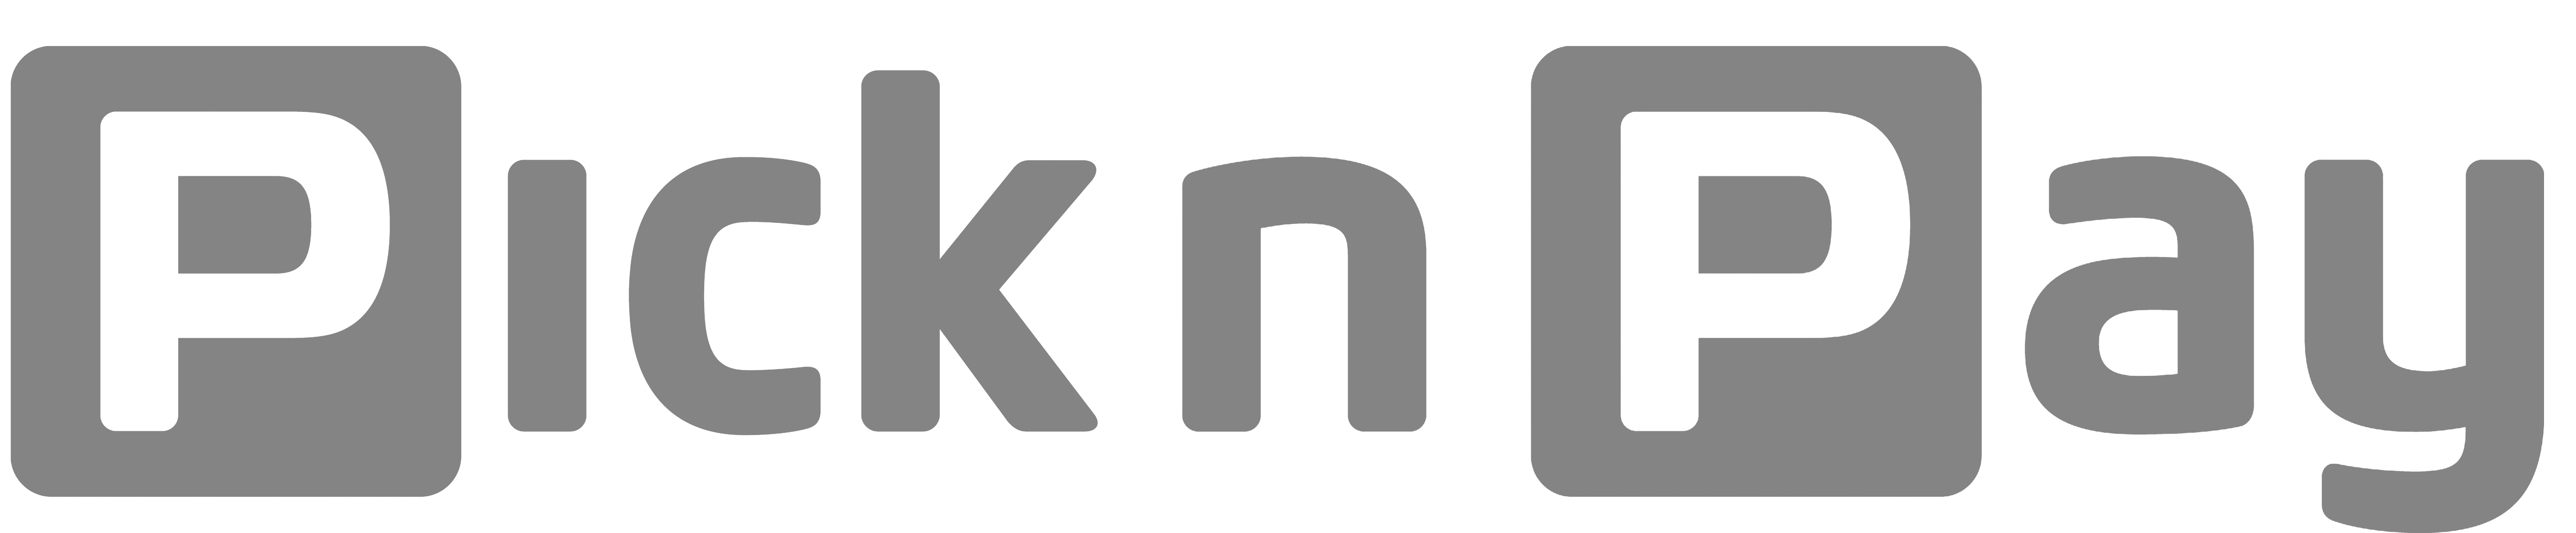 Pick_n_Pay_Logo.png